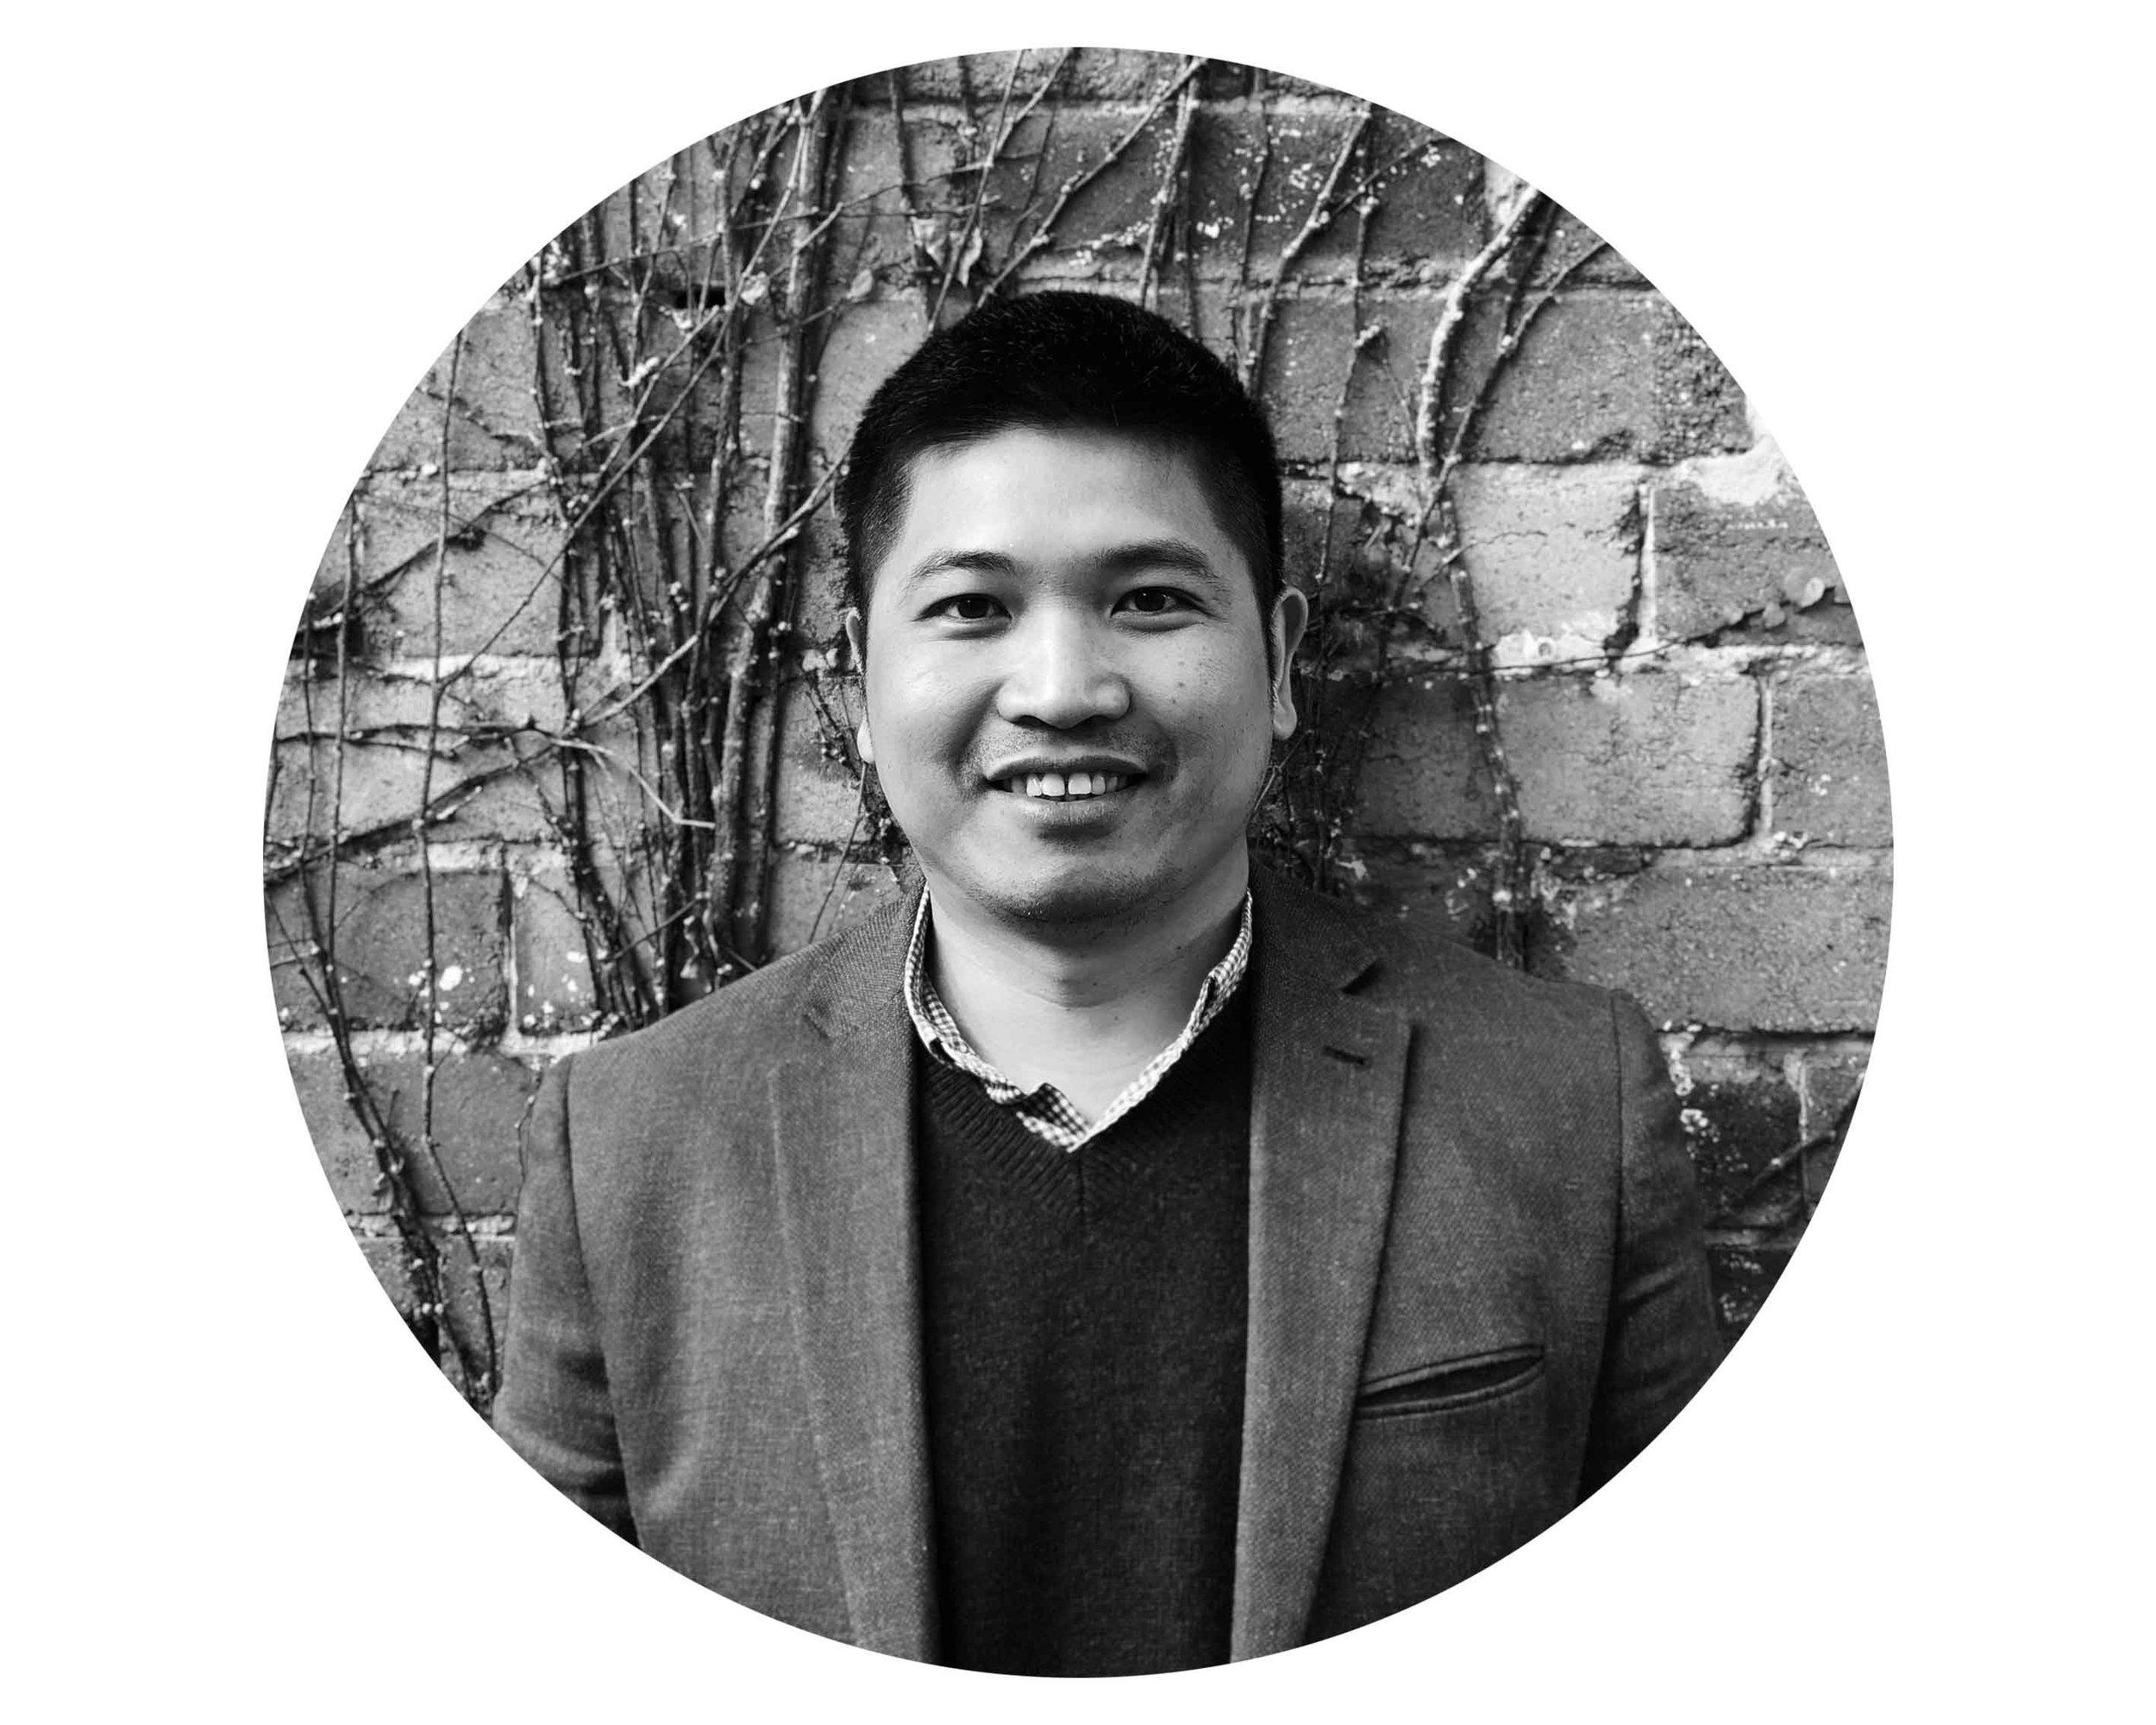 KEVIN HOANG - Snr Economist/Data Scientist